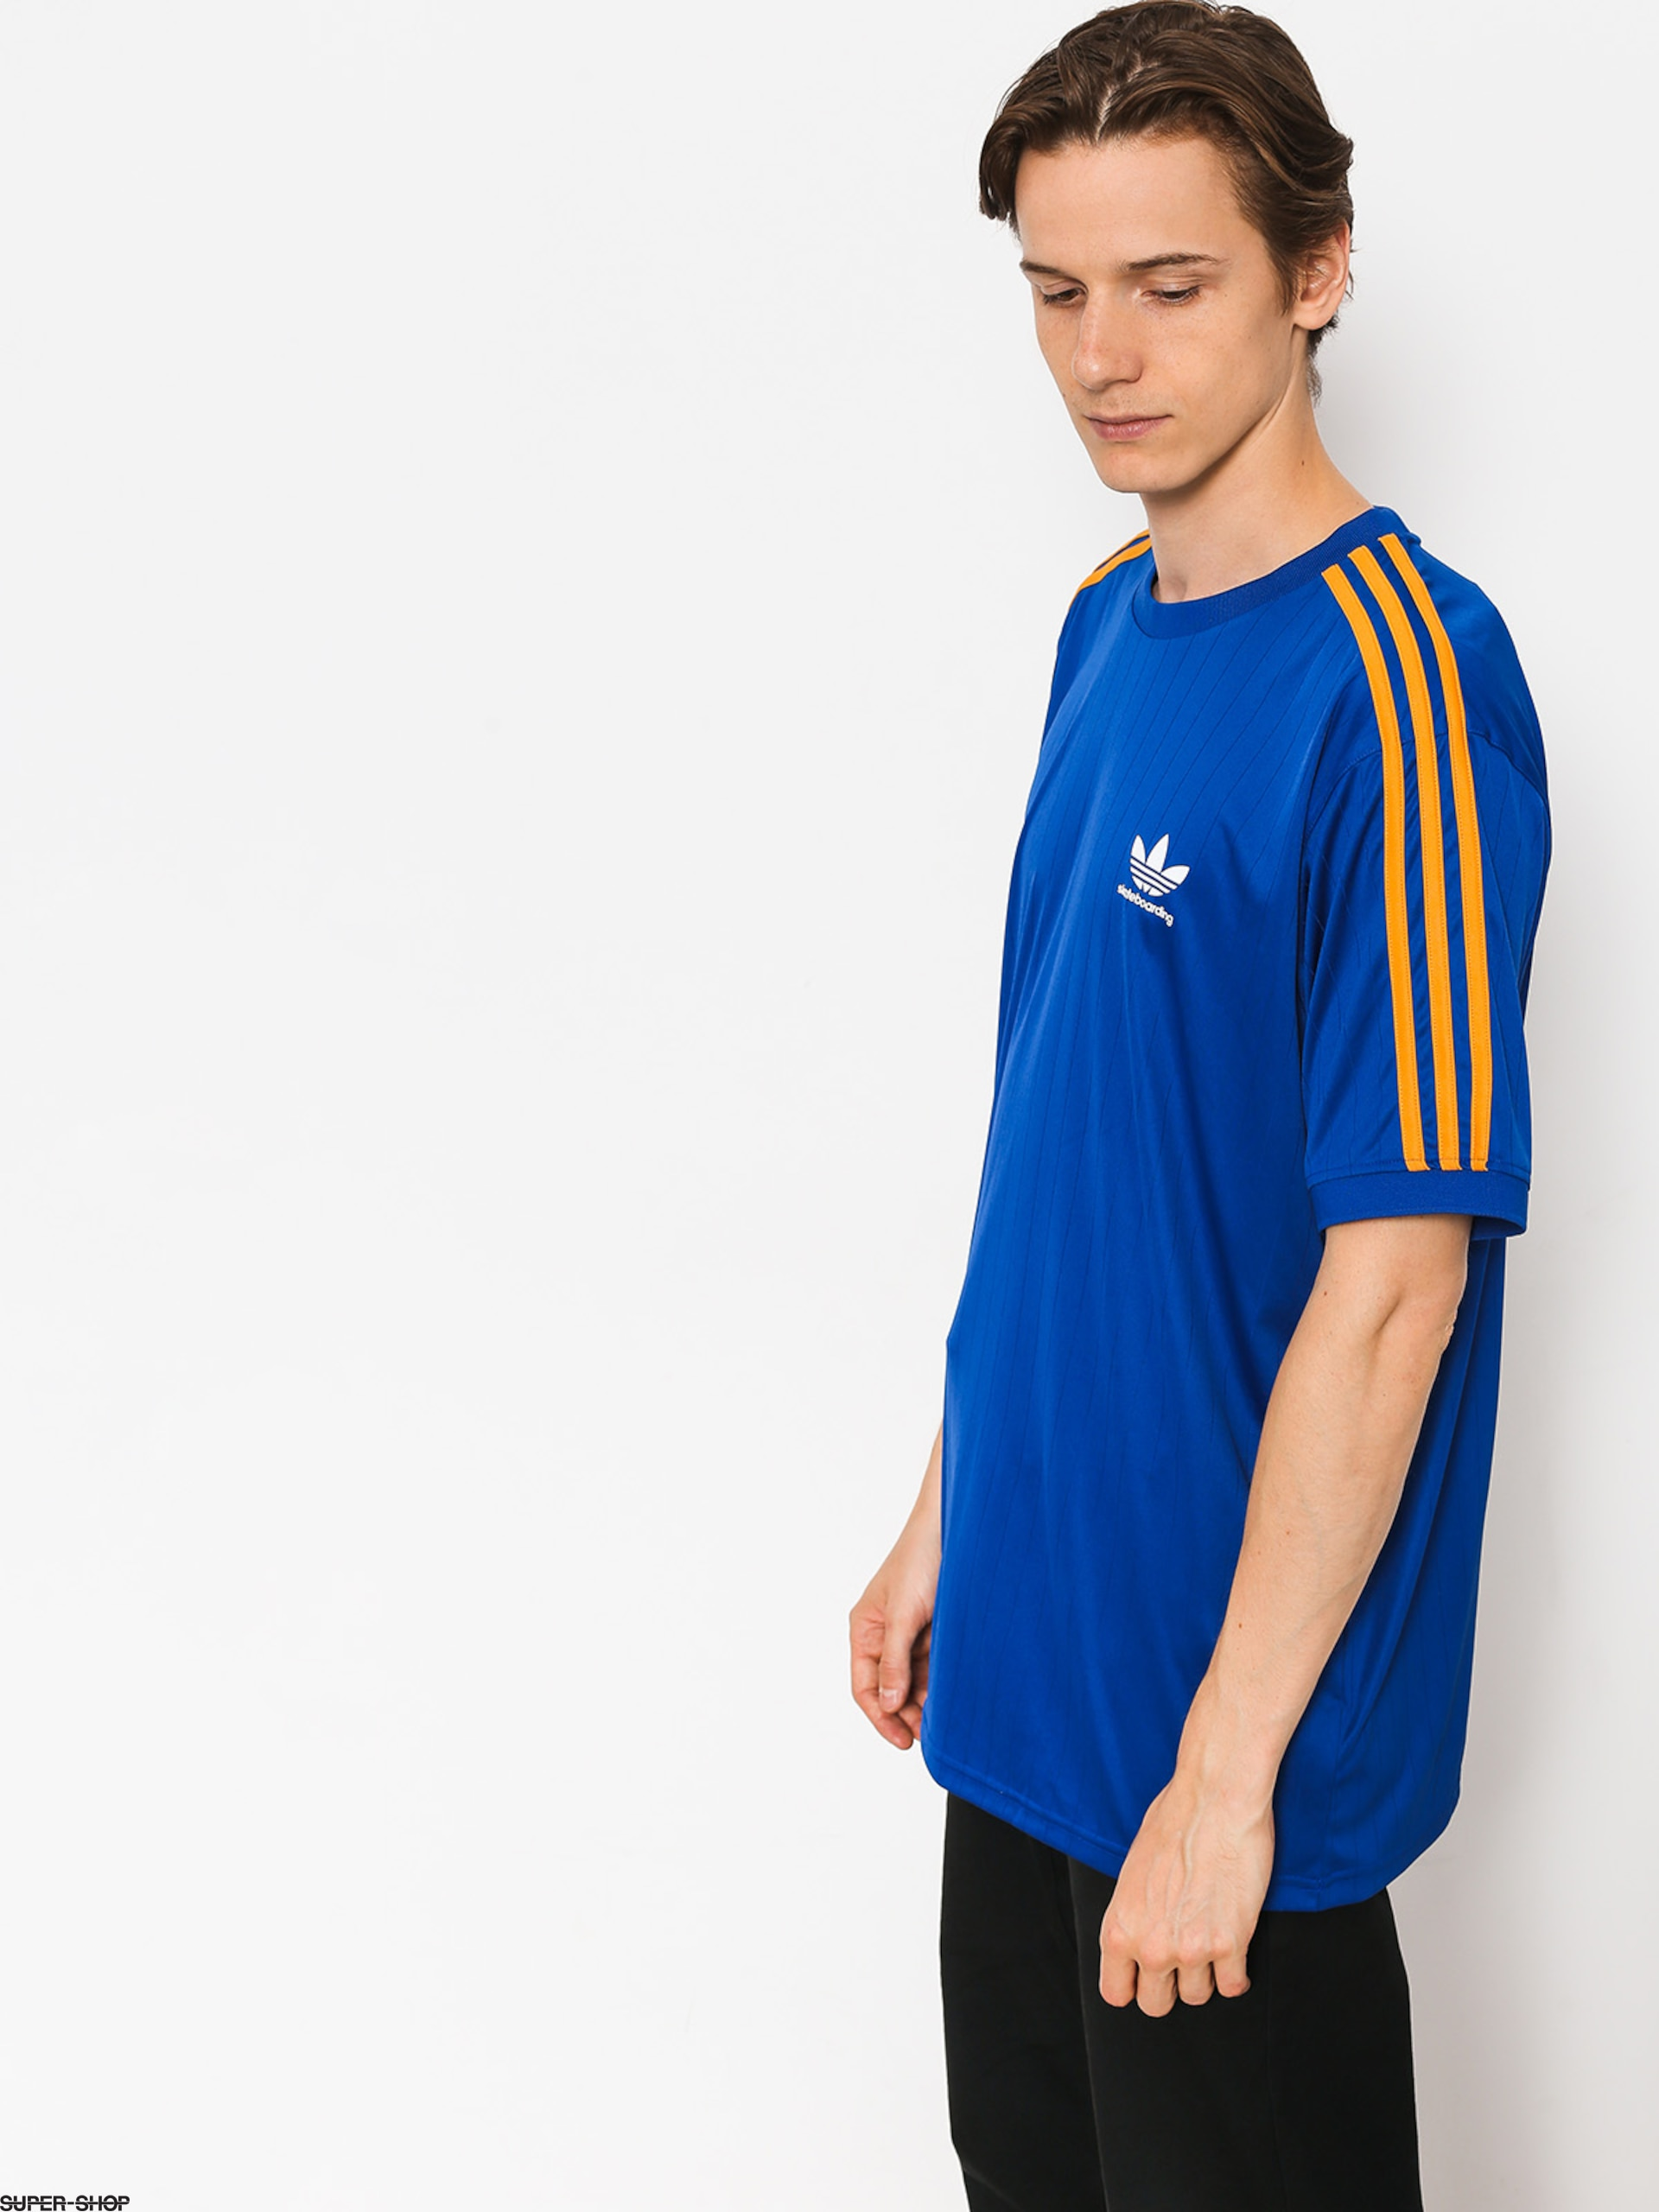 0397c2f27 957346-w1920-adidas-tshirt-bluza-clima-club-jers-collegiate-royal-tactile- yellow-f17.jpg